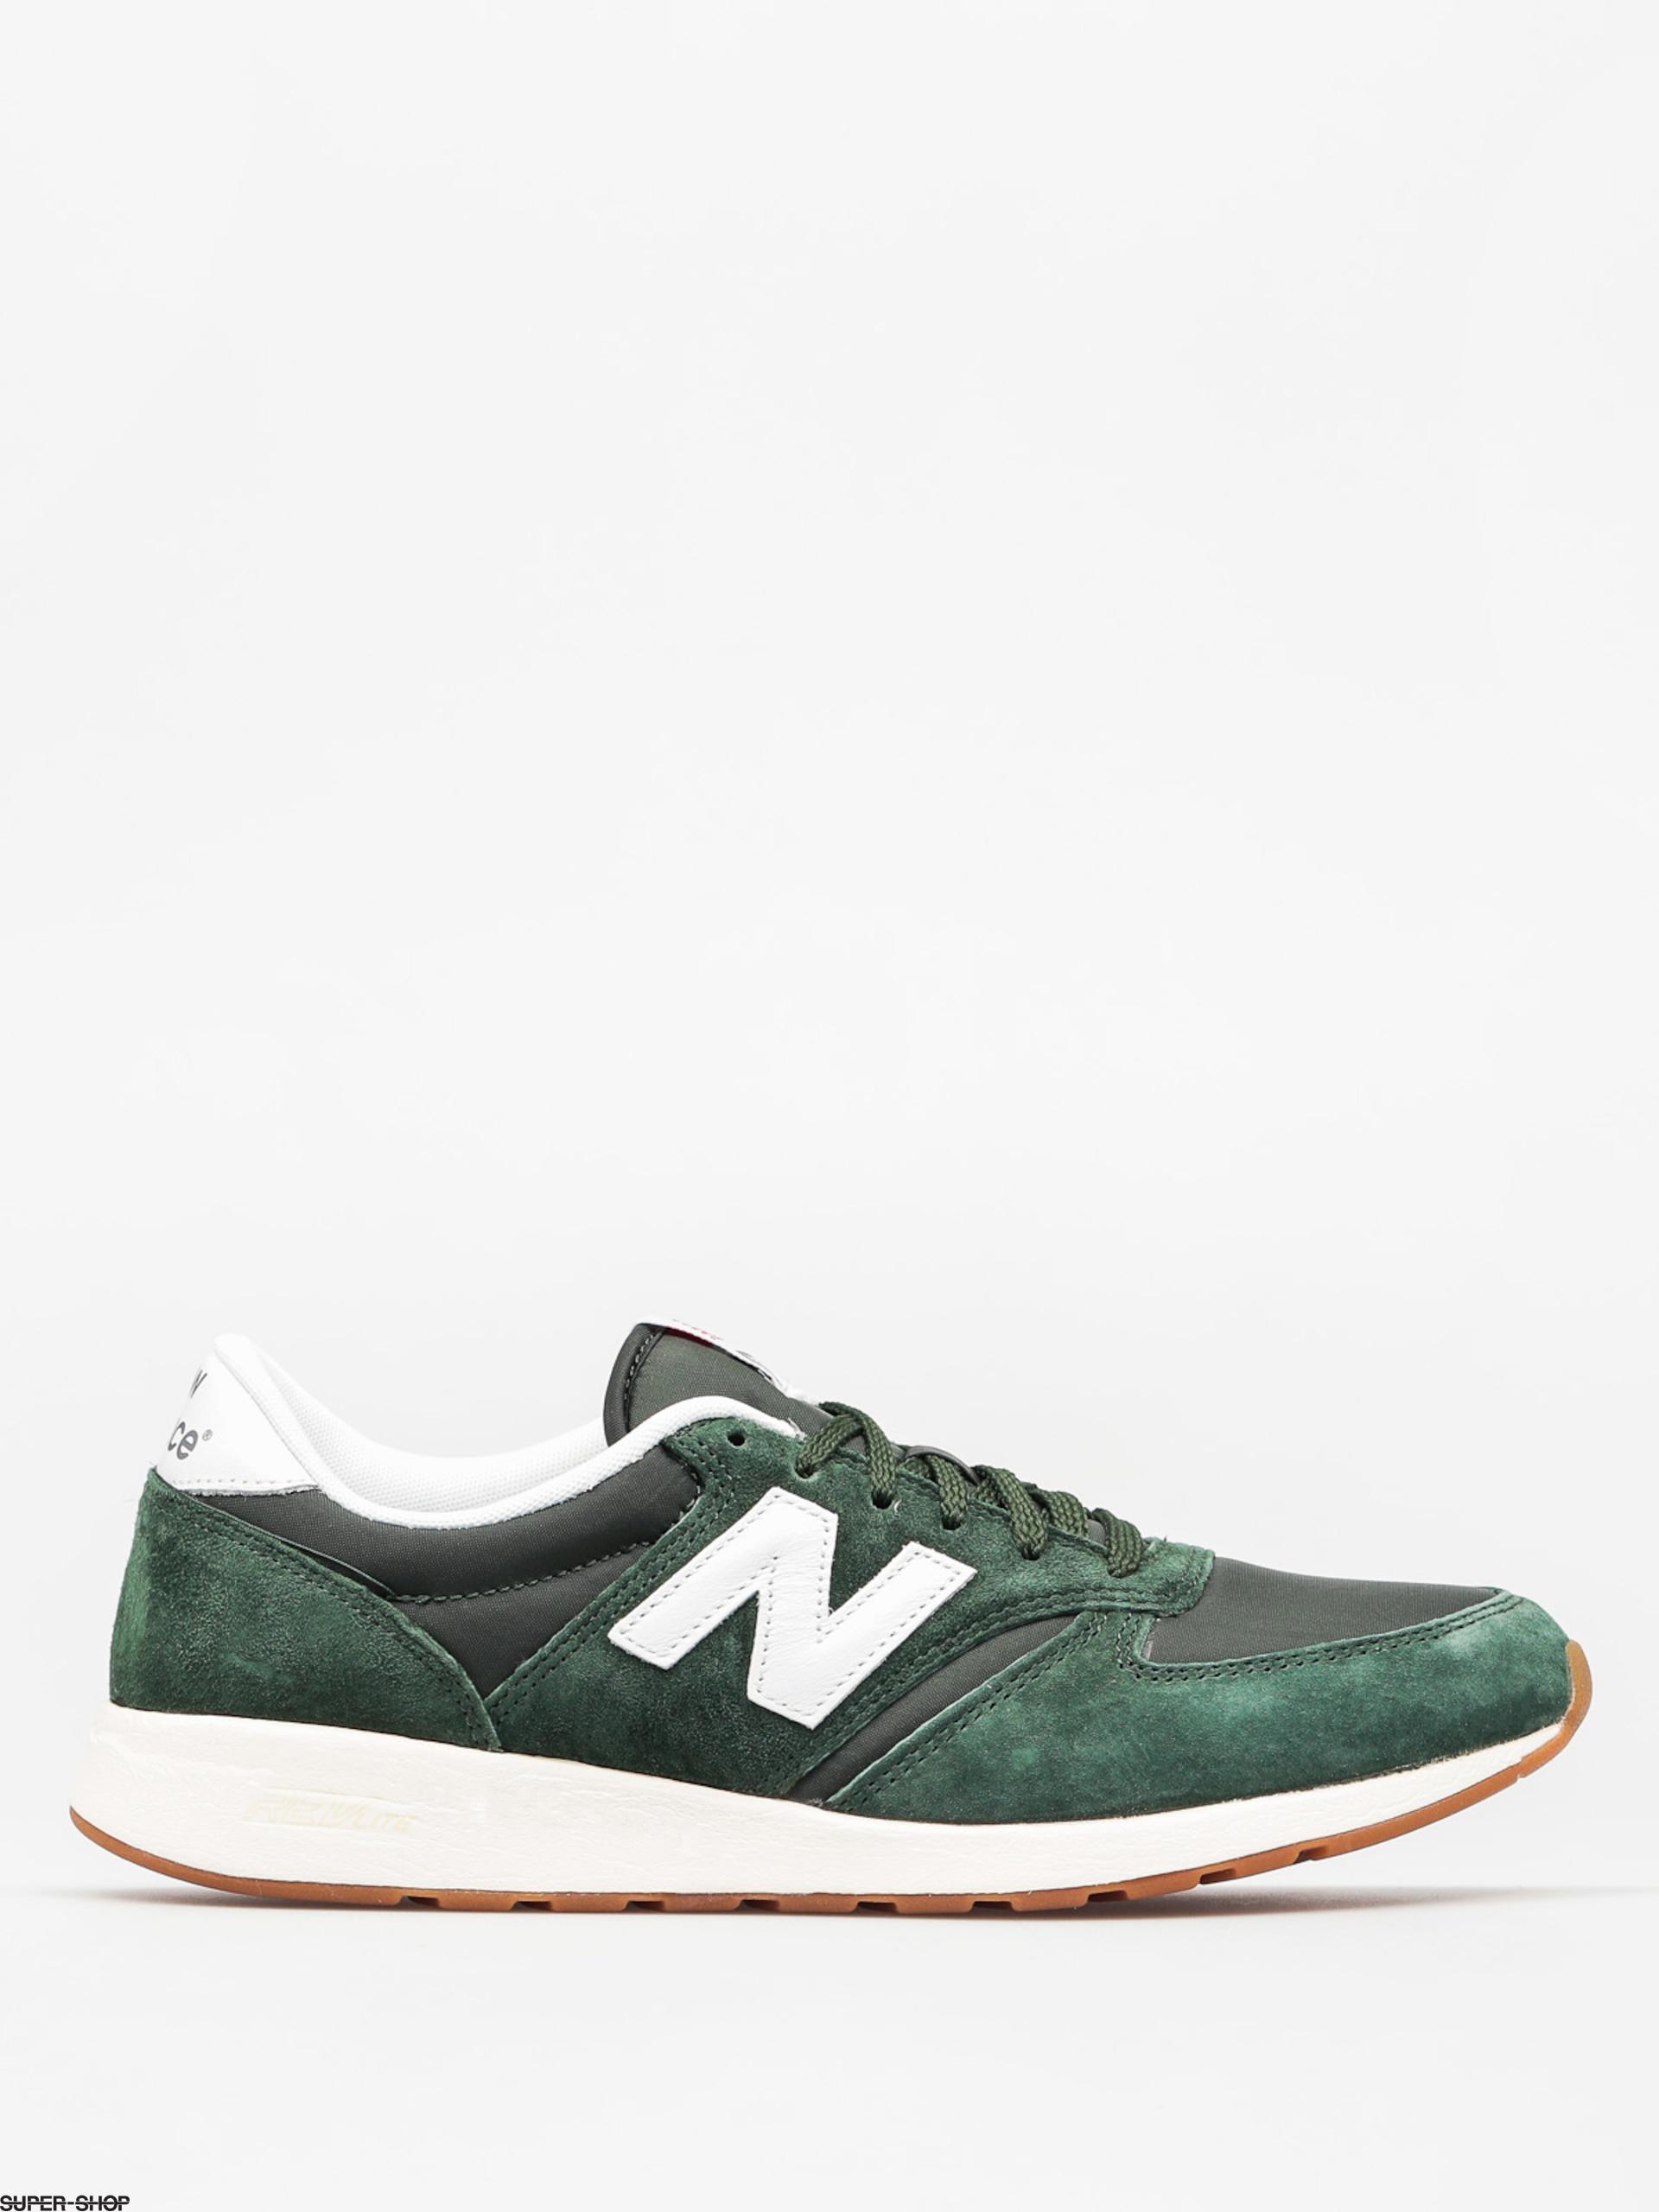 New Balance Shoes 420 (sf)